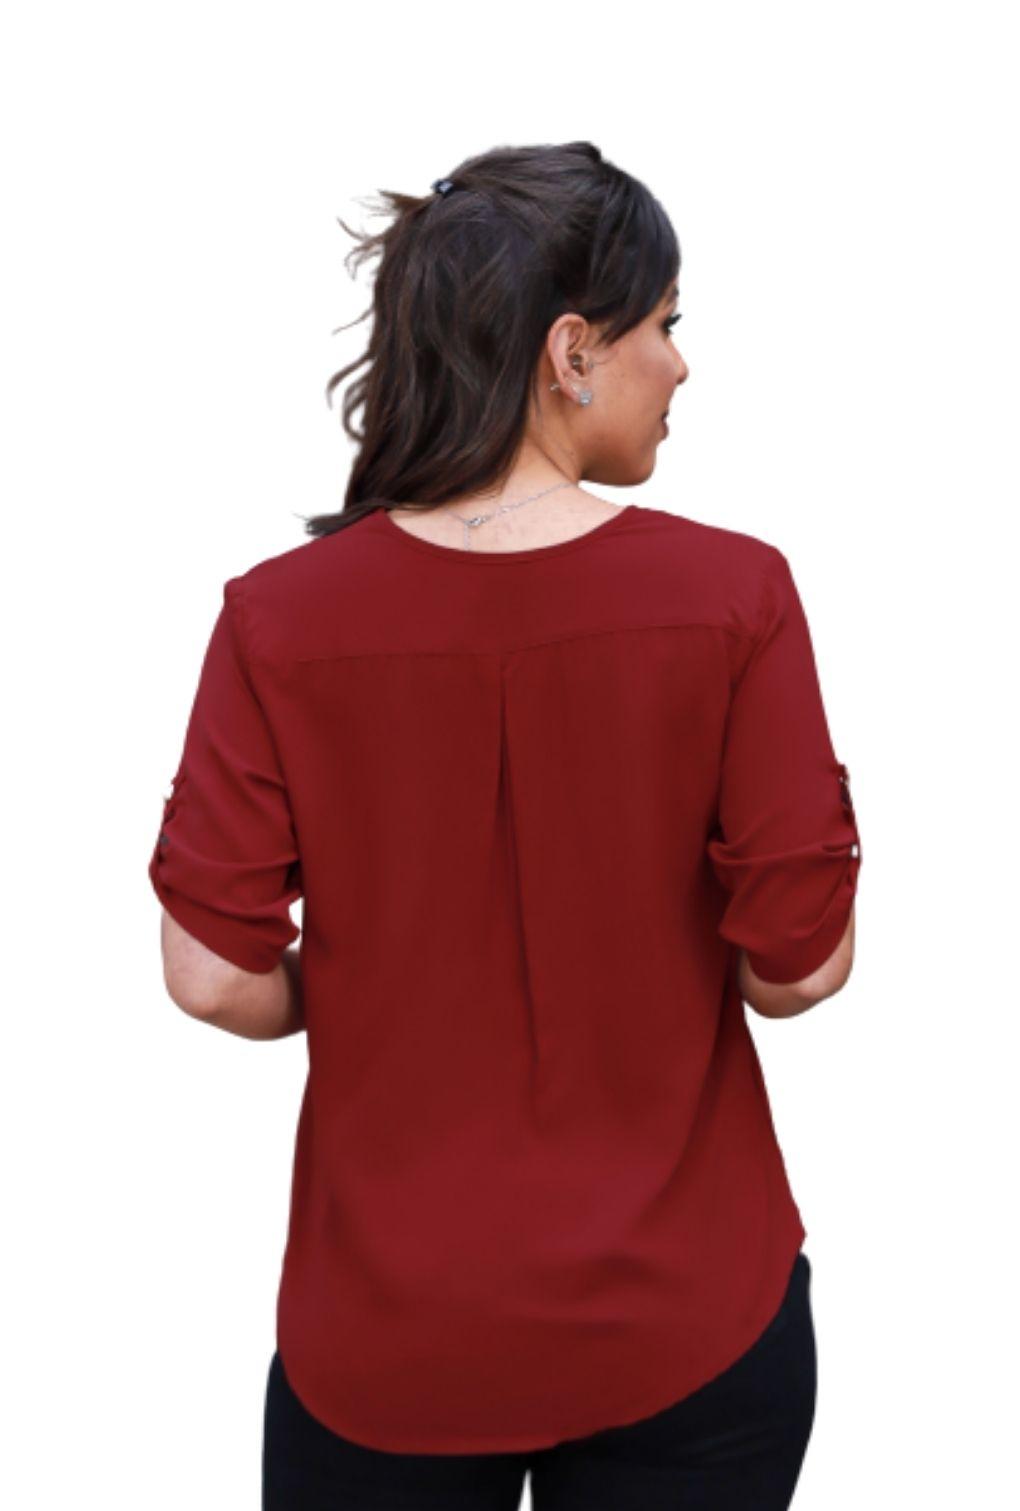 Camisa Blusa Feminina Manga Curta Social Lisa Vinho  - ModaStore | Moda Feminina